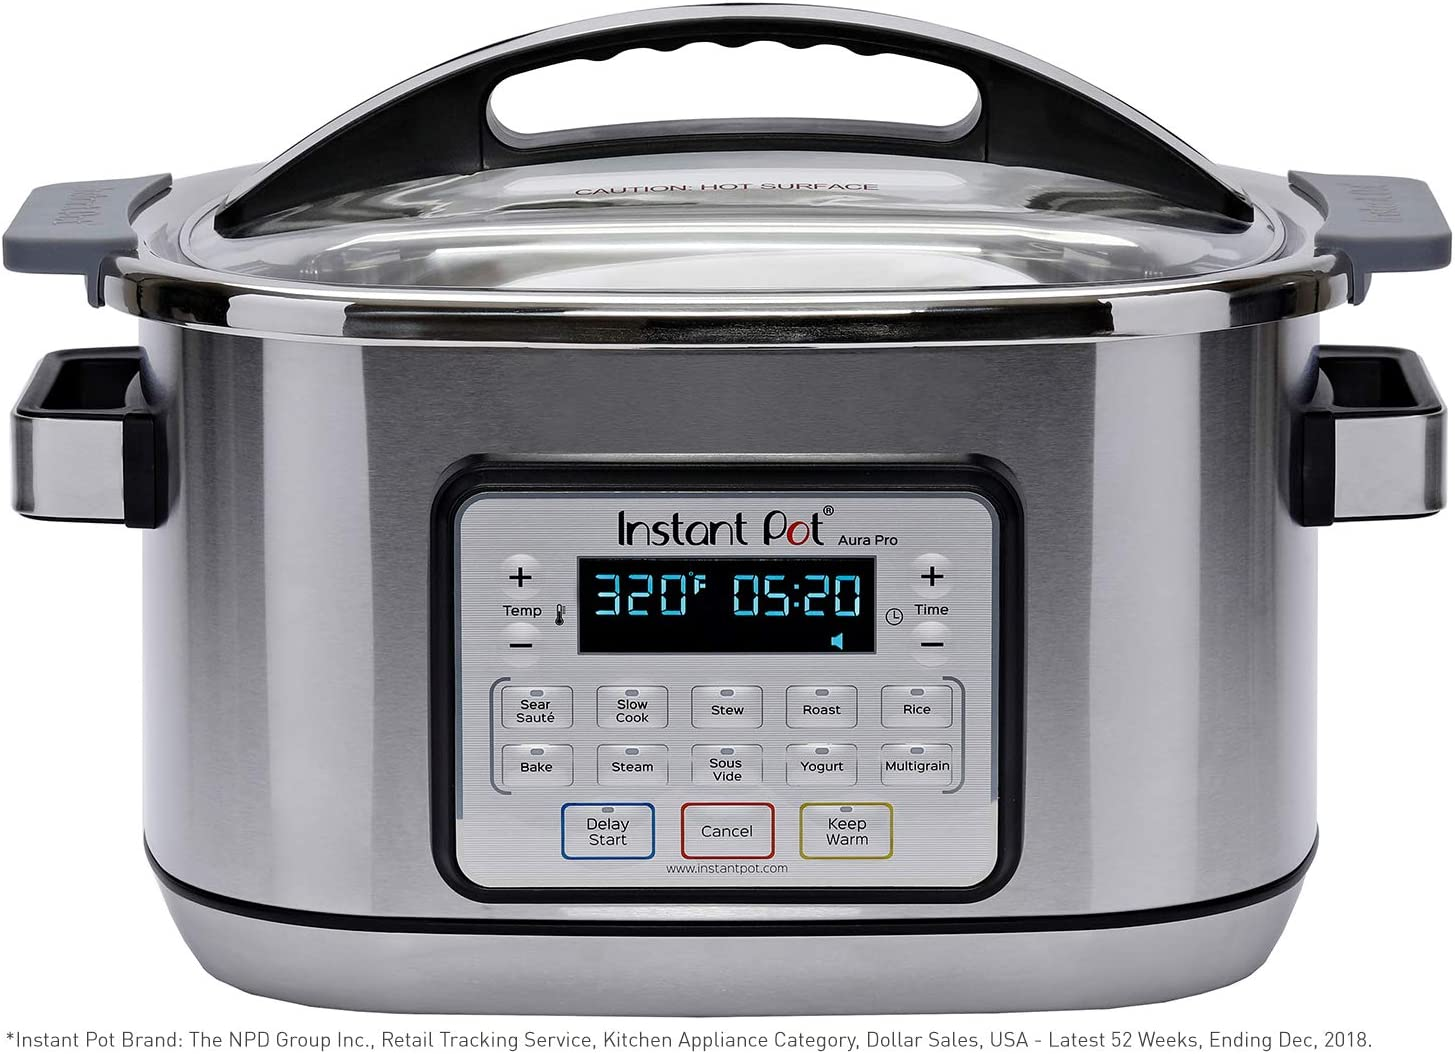 Instant Pot Aura Pro 11-in-1 Multicooker, Slow Cooker, Rice Cooker, Grain Maker, Steamer, Saute, Yogurt Maker, Stew, Bake, Roast, and Warmer|8 Quart|11 One-Touch Programs